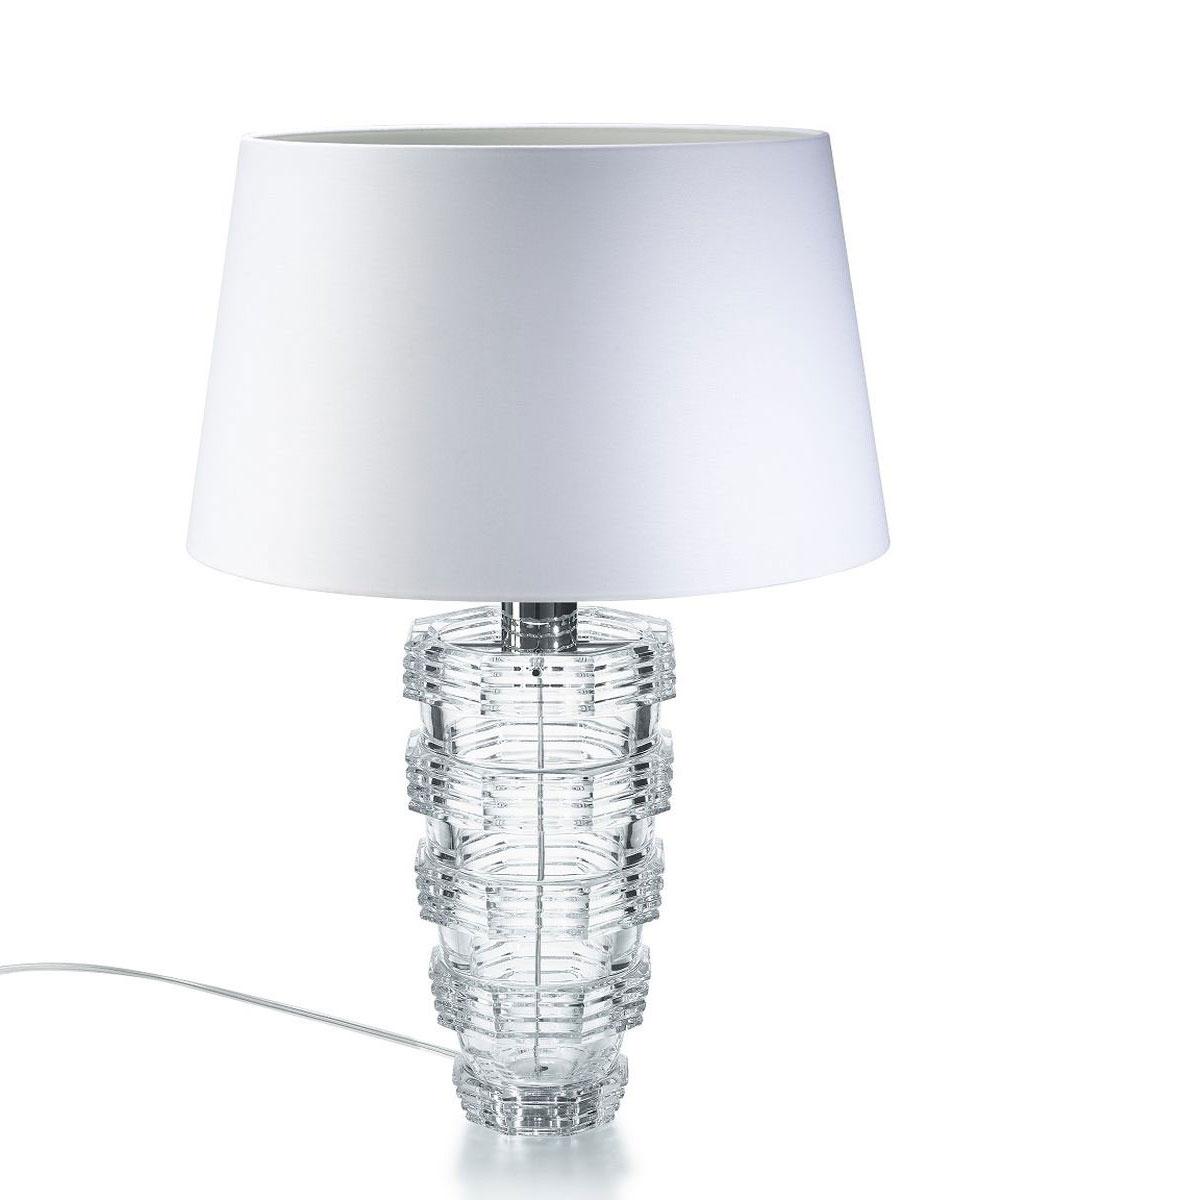 Baccarat Crystal, Heritage Cordon Crystal Lamp